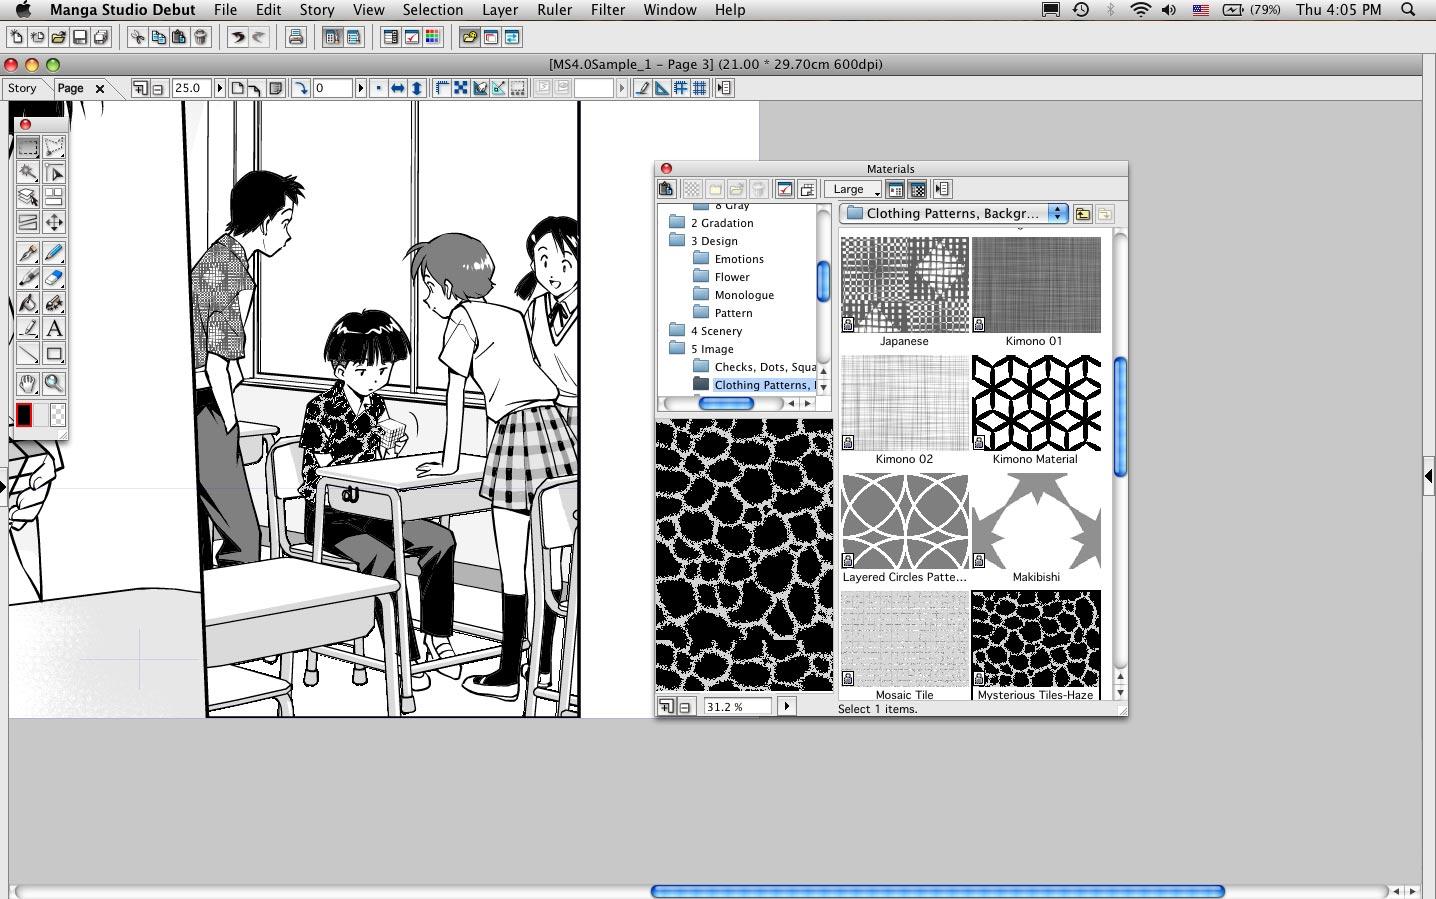 manga-studio-debut-programs-draw-manga.jpg